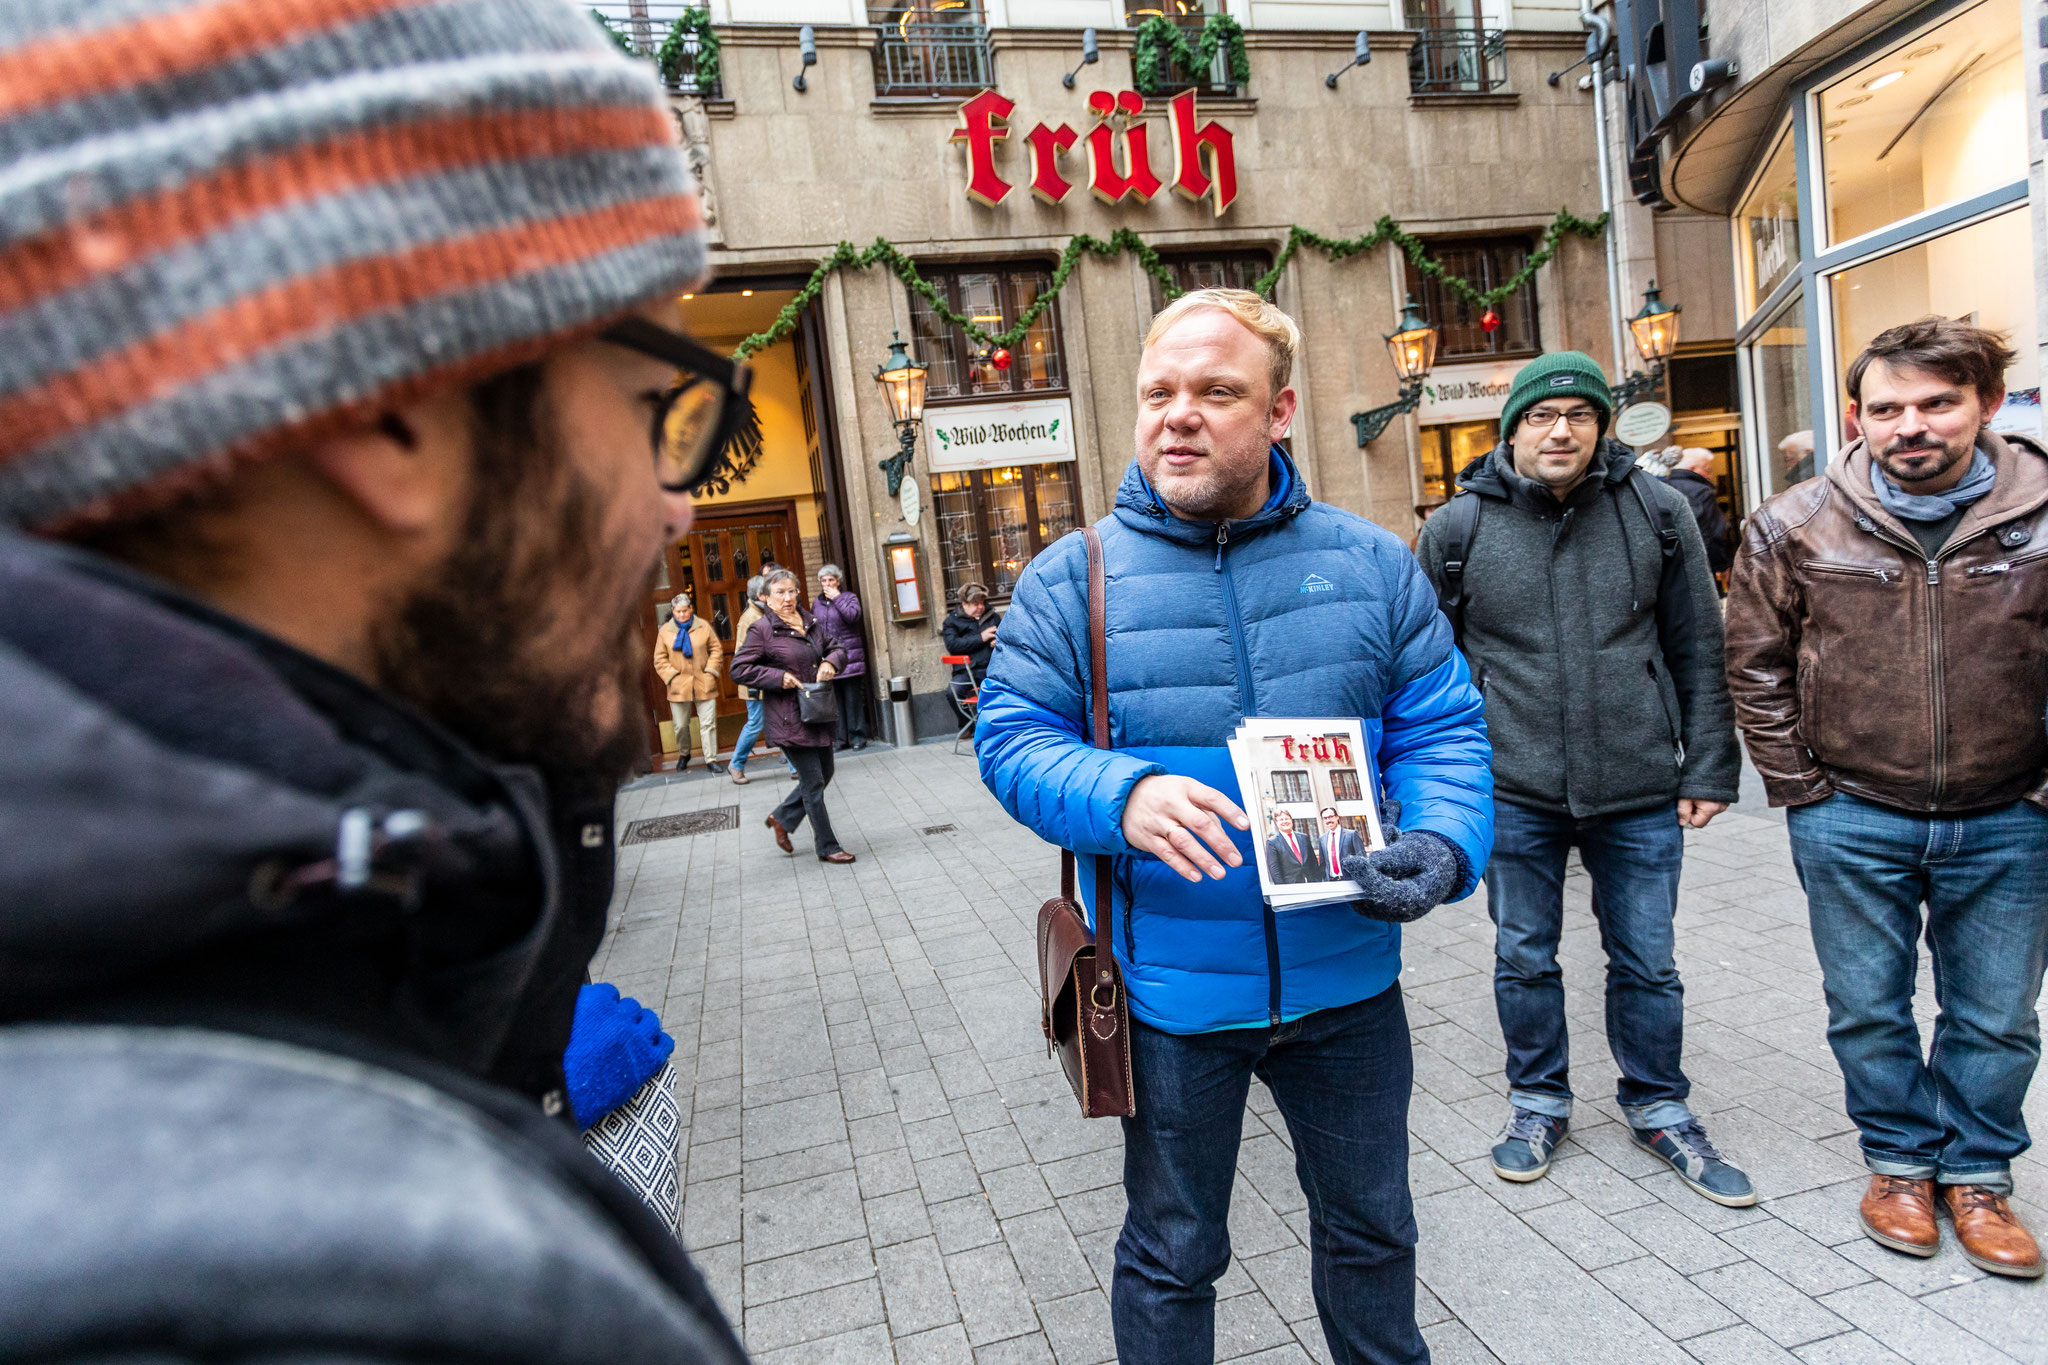 Brauhaustouren - Brauhaus Früh & seine Geschichte